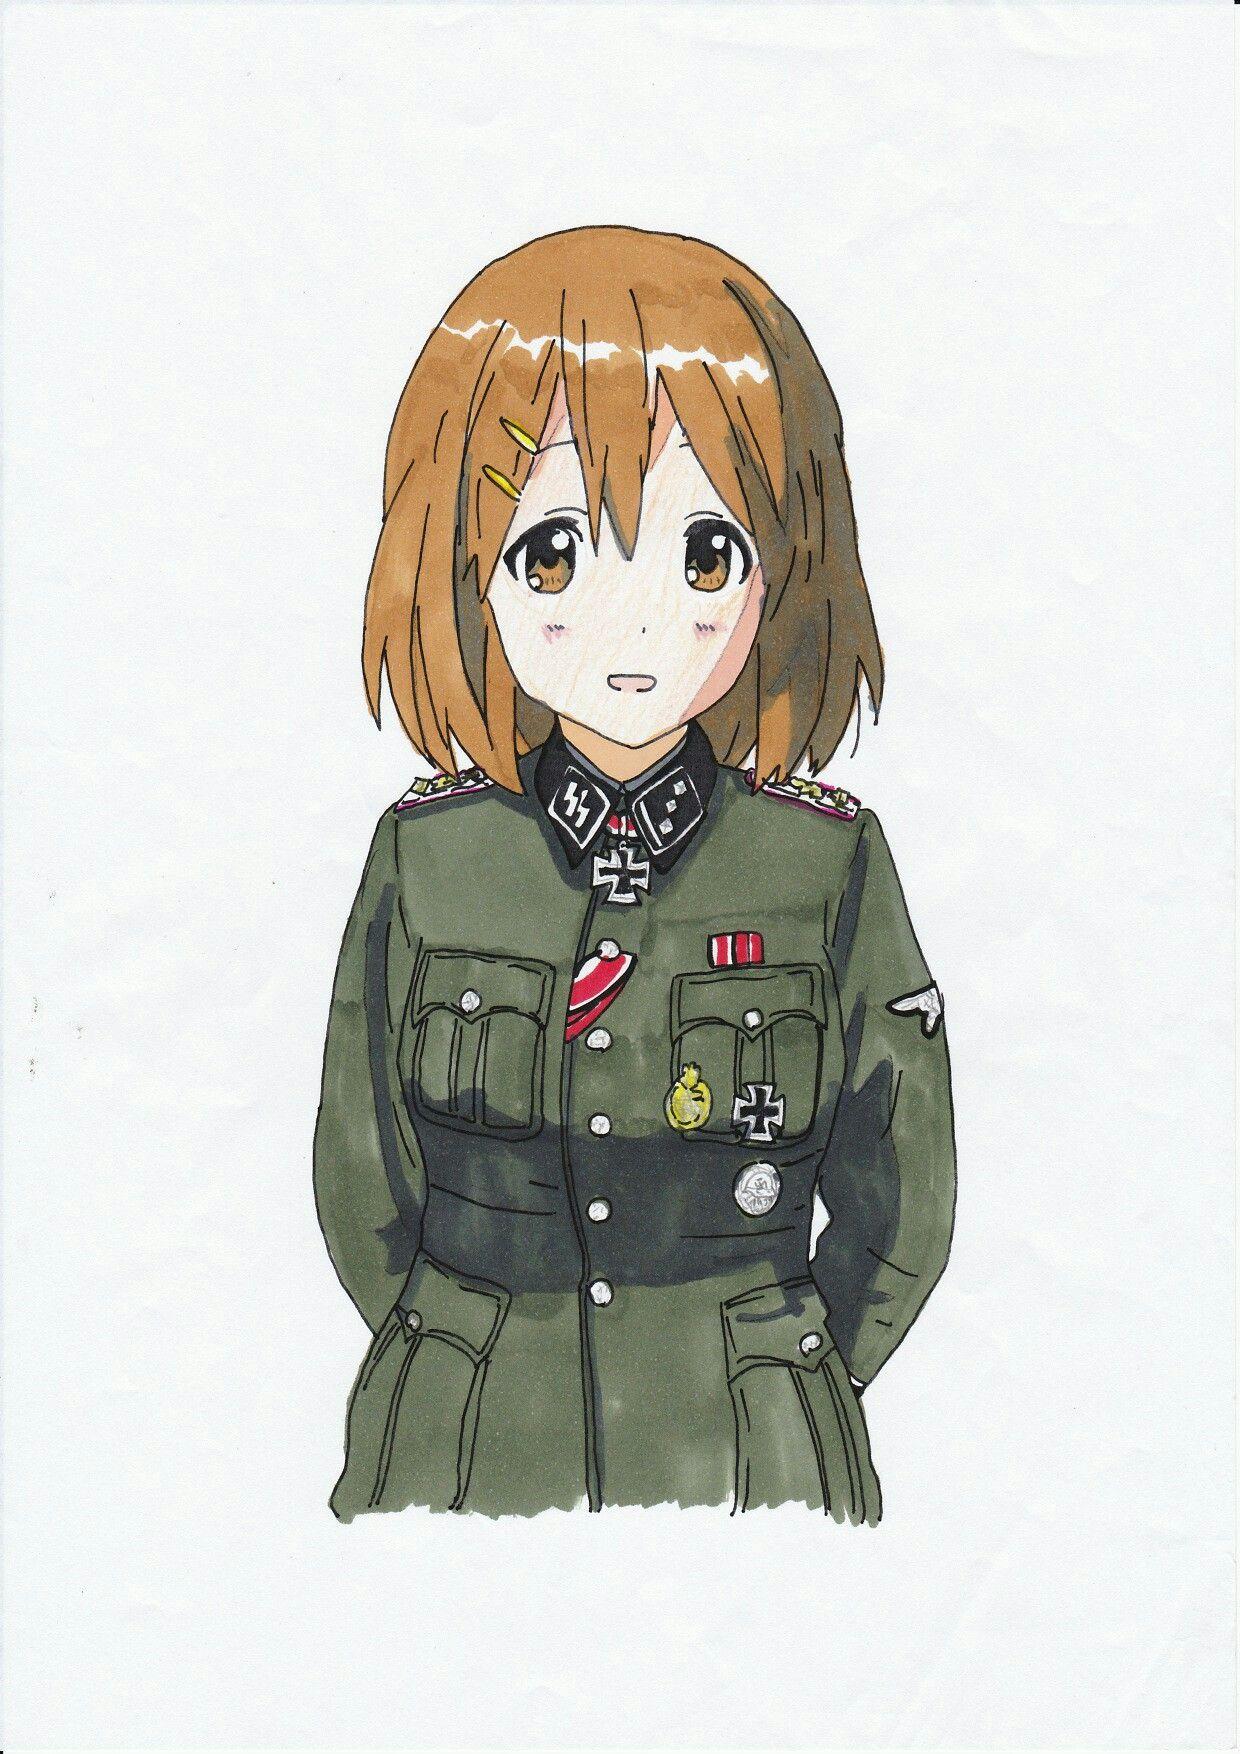 Pin by Mexican Pony on Military anime Kawaii anime